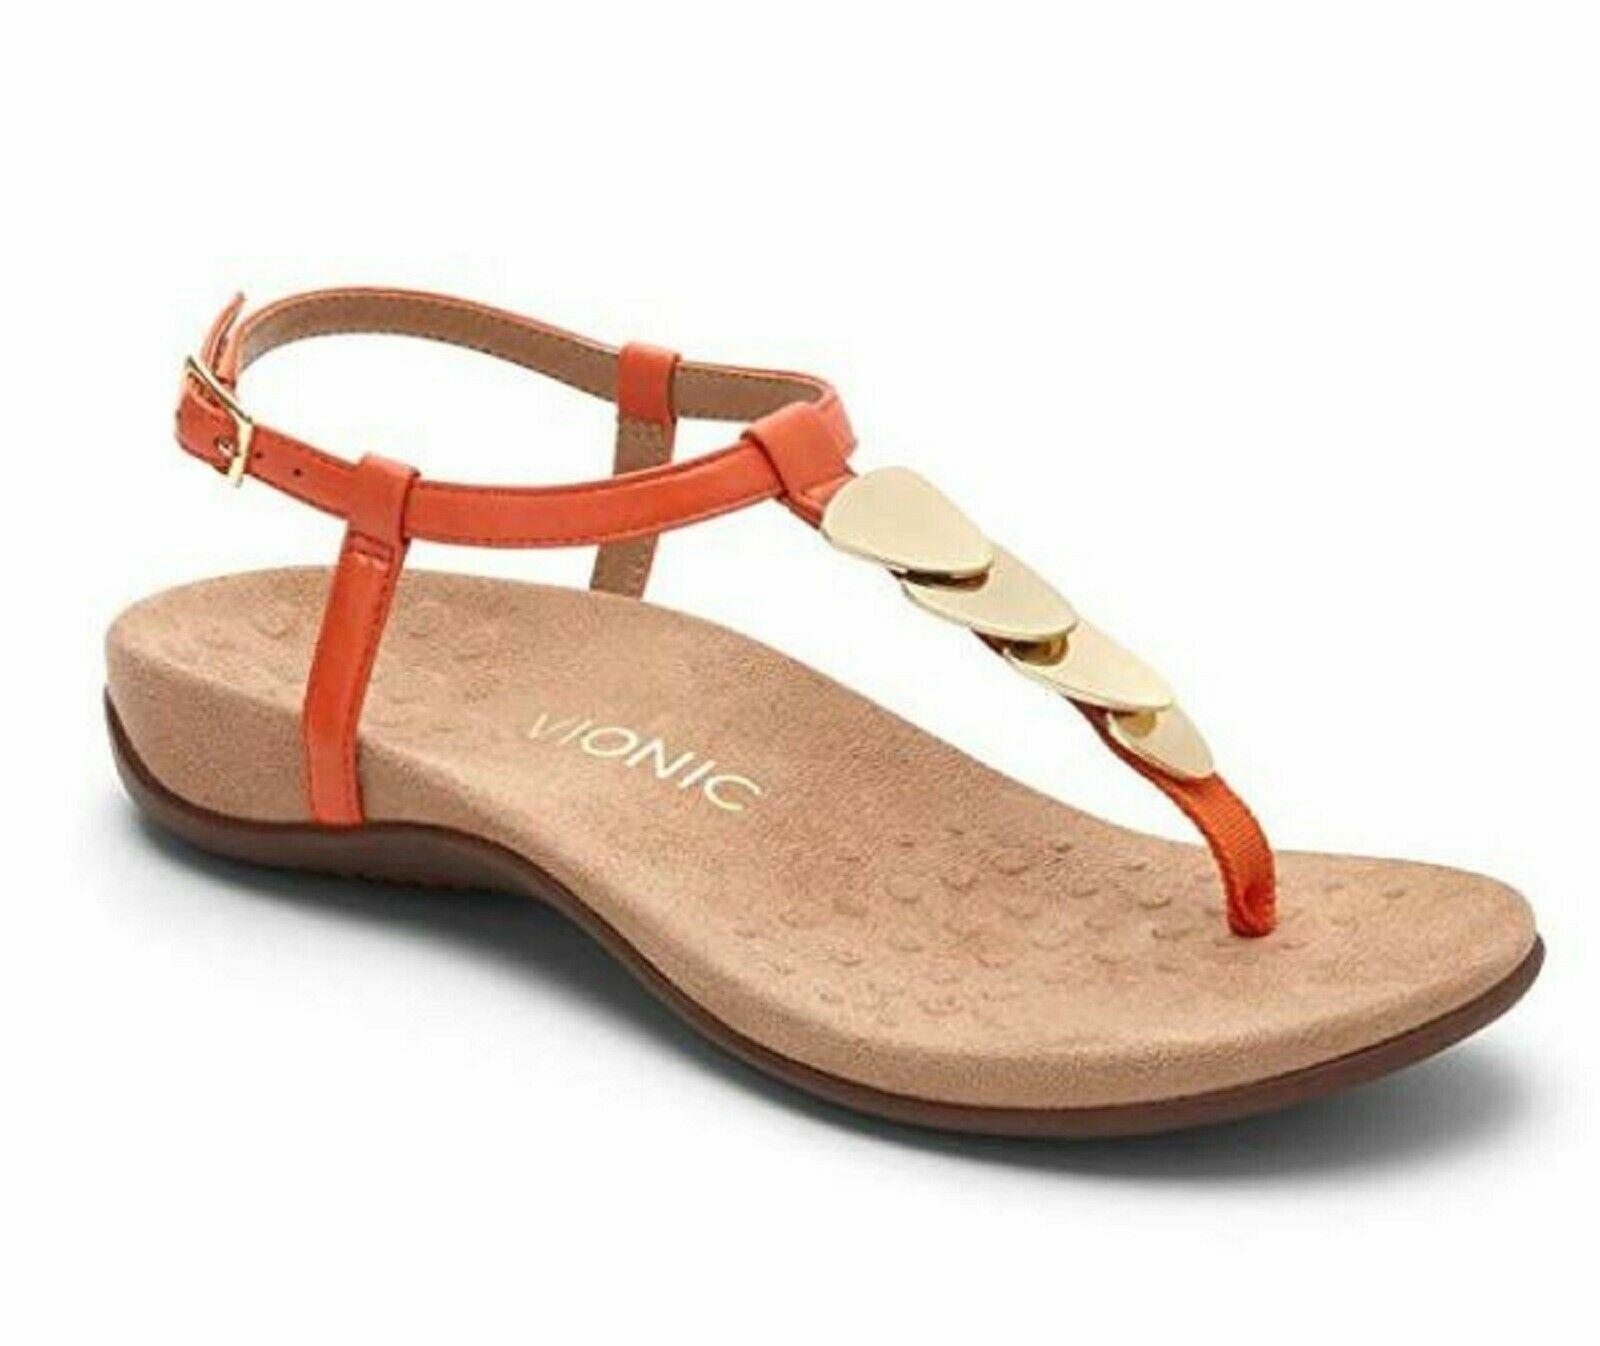 Femmes Vionic Repos Miami T-Sangle Sandales Tongs Cuir Orange or Sz 8-11 Nib